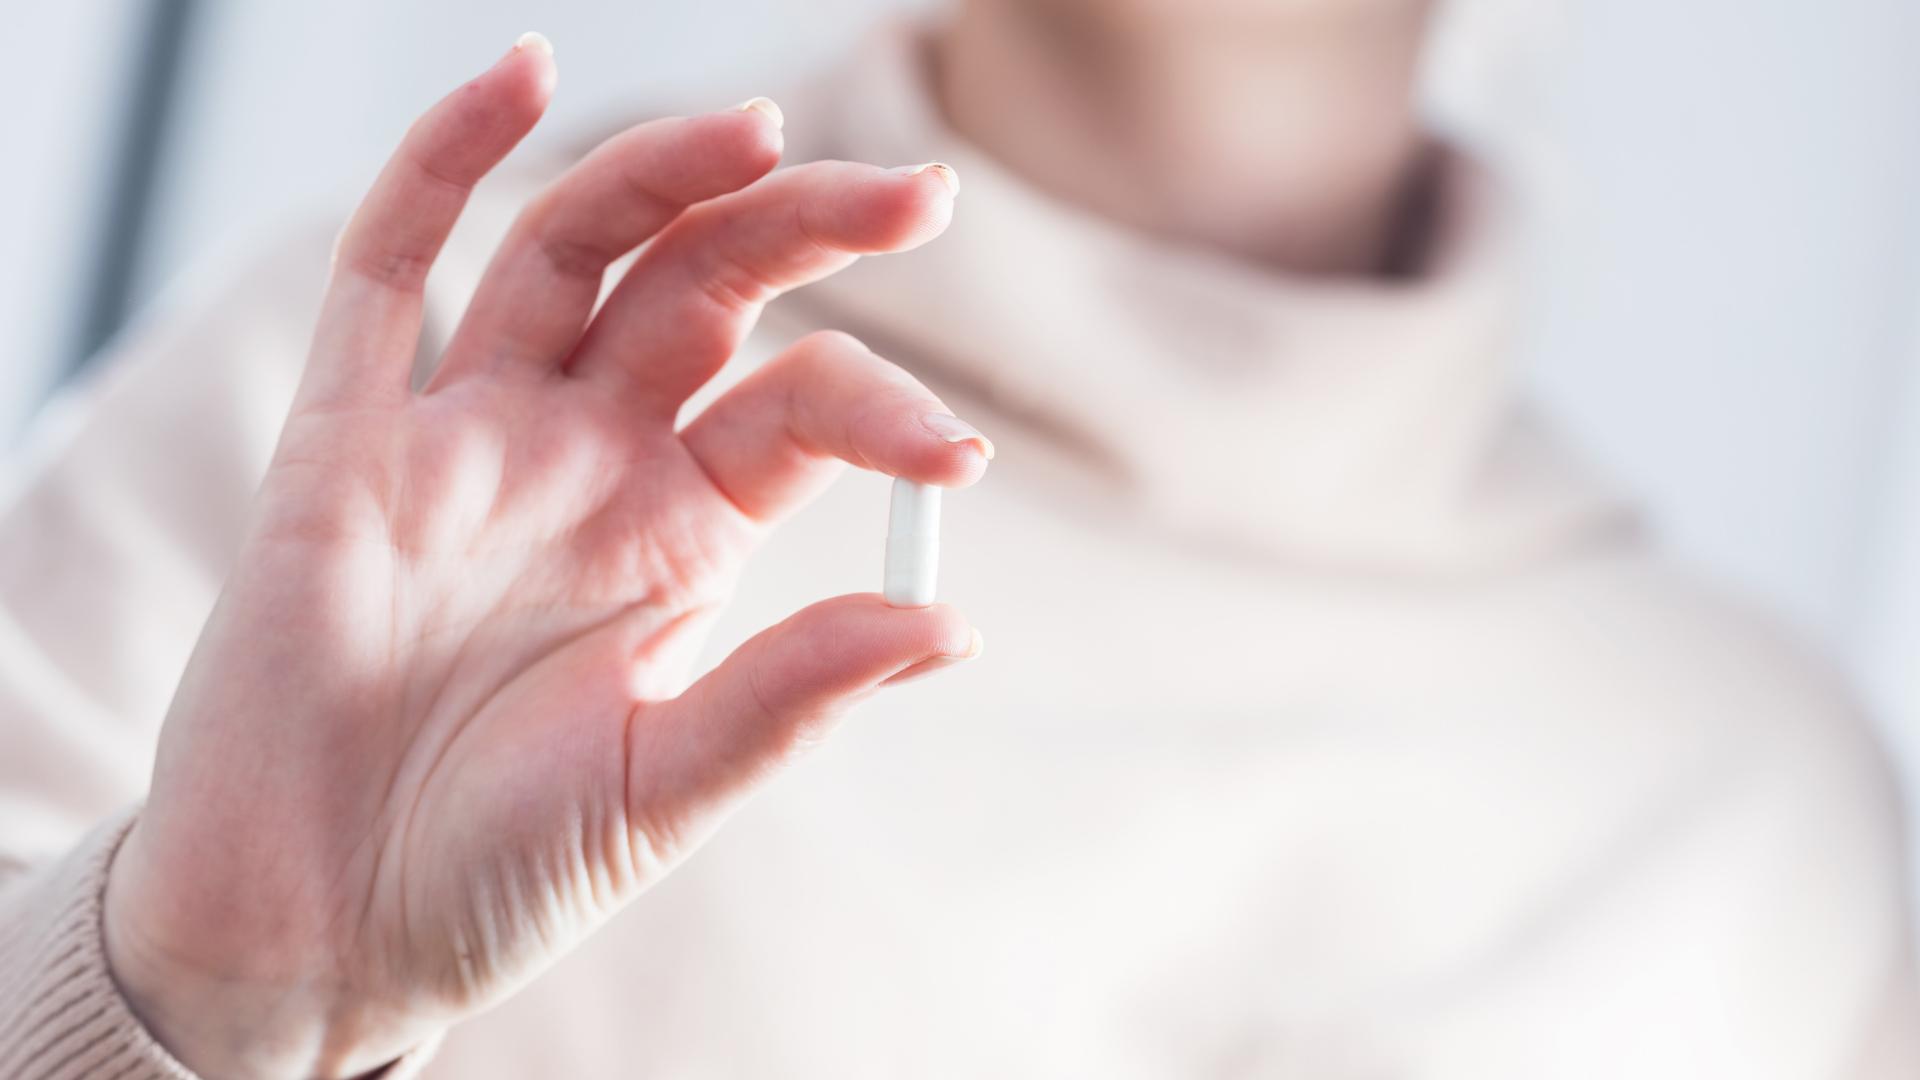 Read more about the article Φαρμακορρύθμιση/Κανονιστικές Υποθέσεις (MSc,1.5 έτος ή 3 εξάμηνα)-Εξ Αποστάσεως